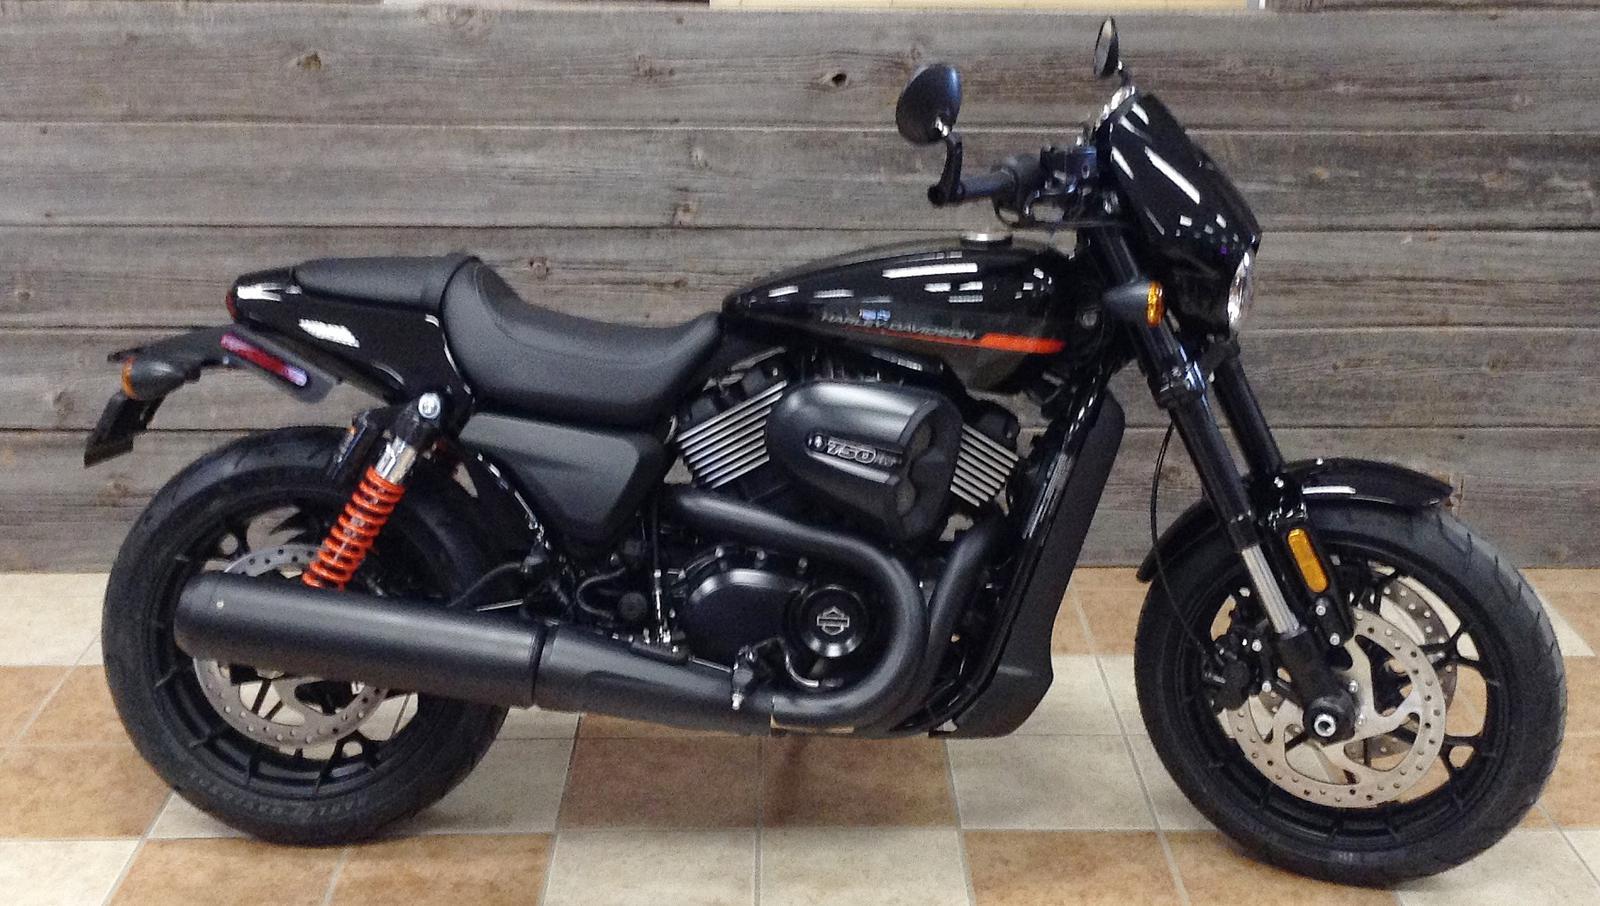 2019 Harley-Davidson® Street Rod® for sale in Bonduel, WI